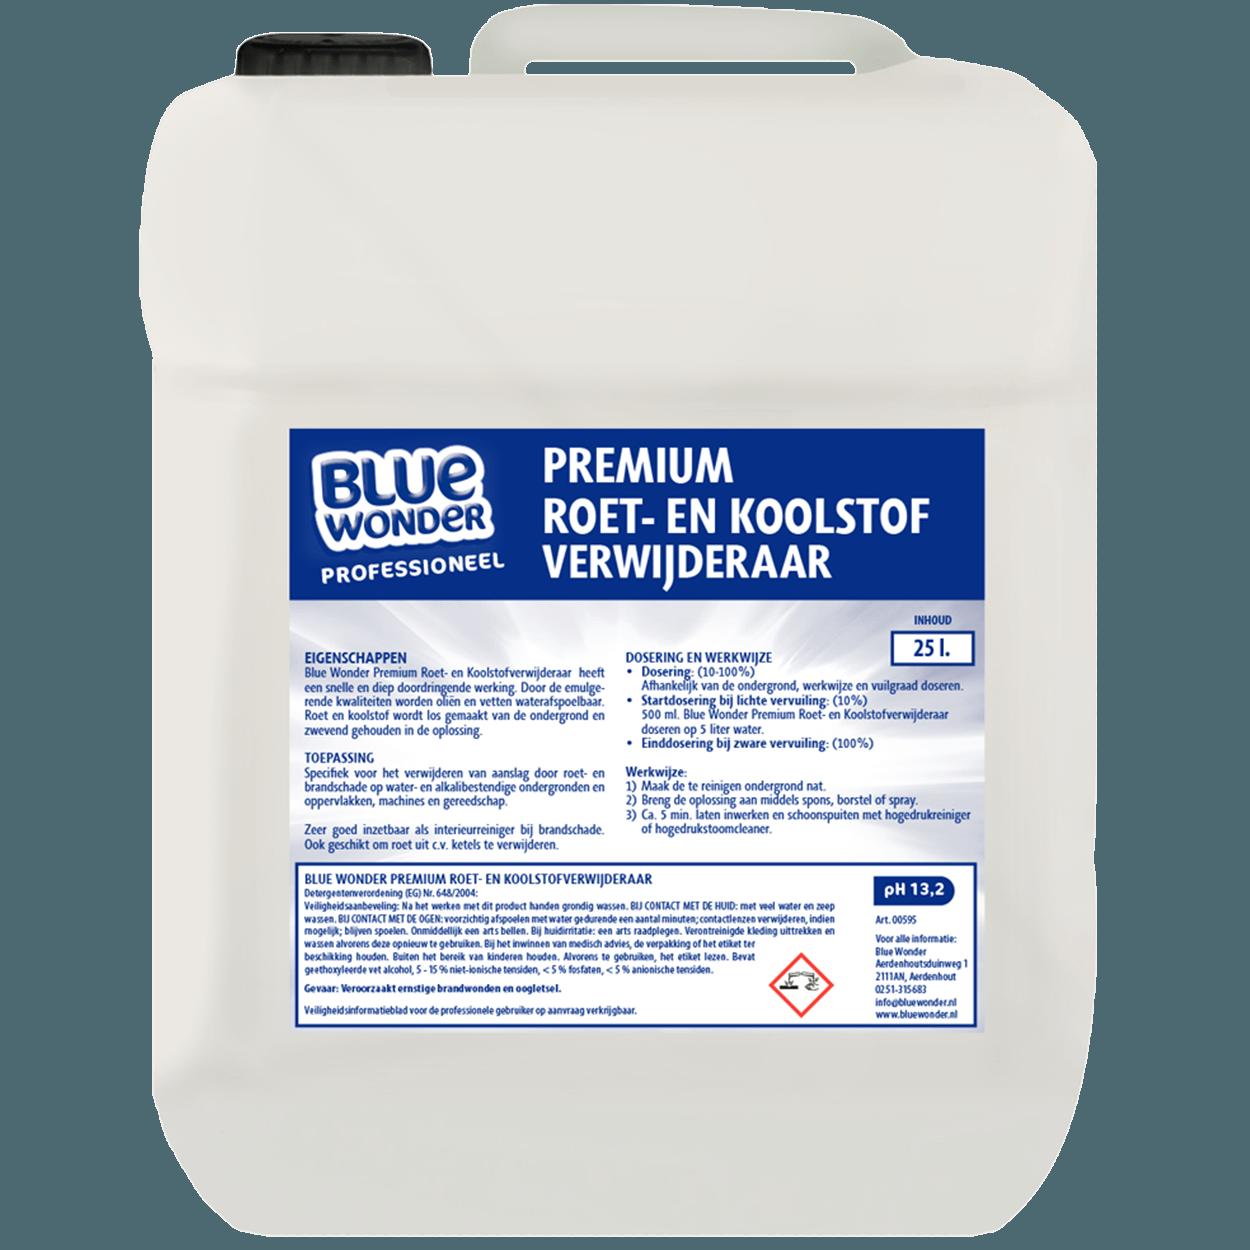 00595_Blue-Wonder_Premium-Roet-en-Koolstof-Verwijderaar_Professioneel